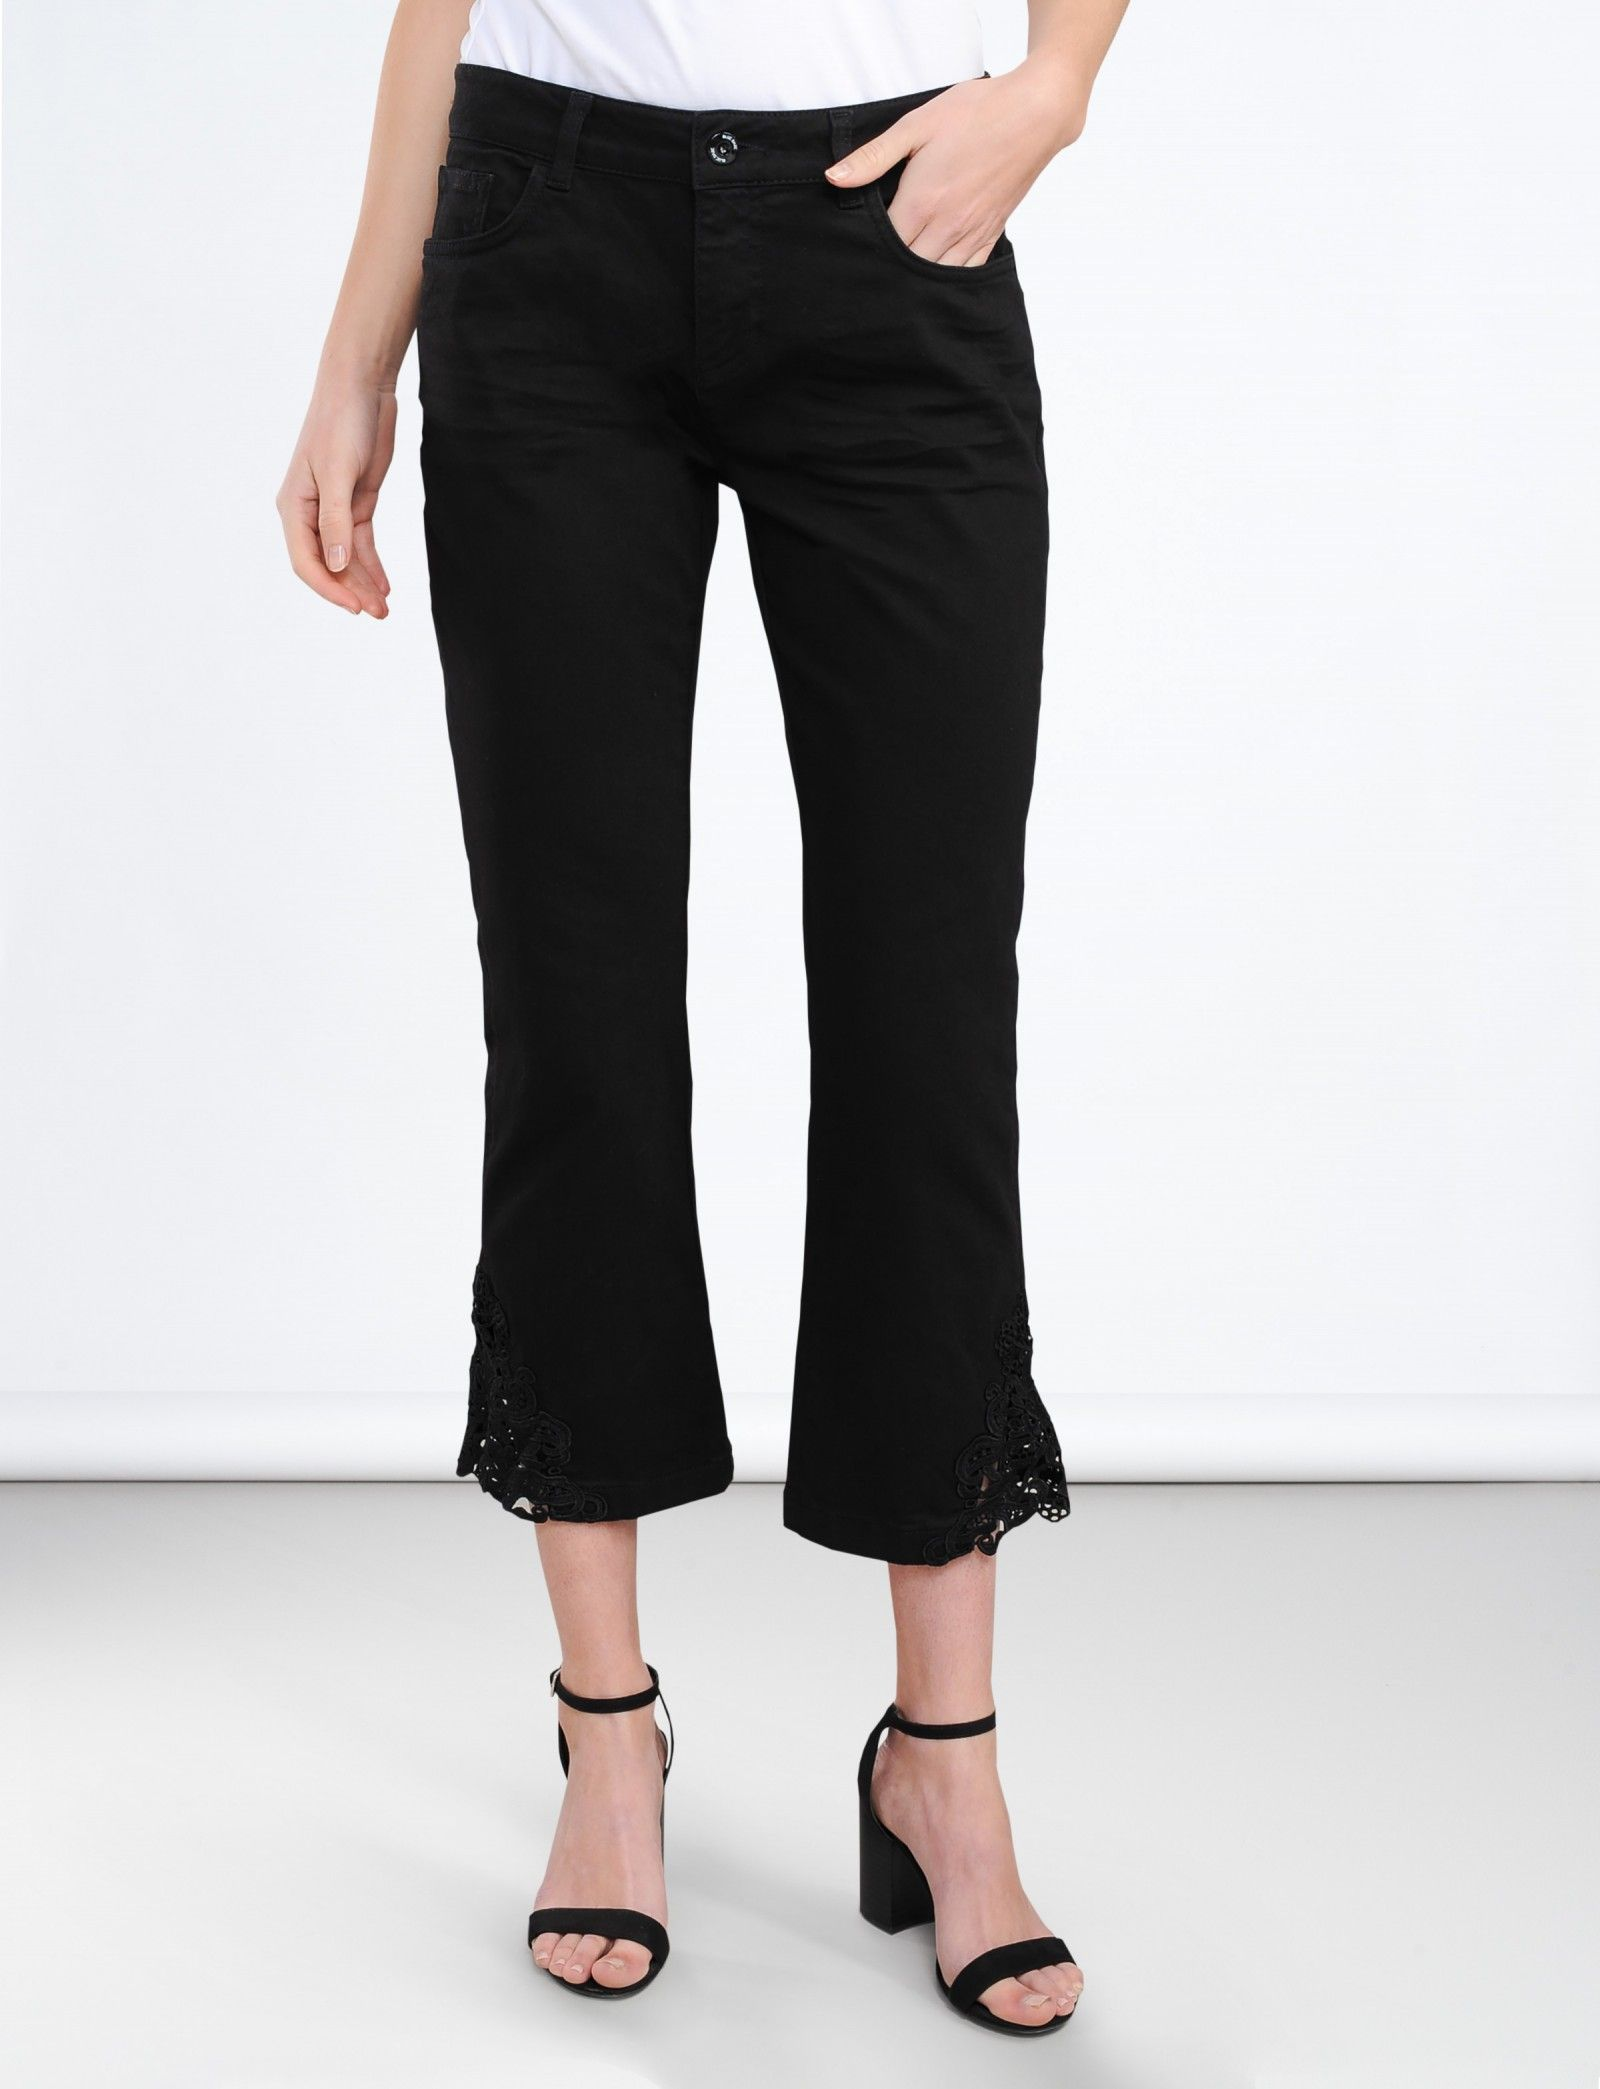 ed99c2ab5c4fd6 Jeans met kant - Broeken - Shop - Summum Woman Online Shop ...